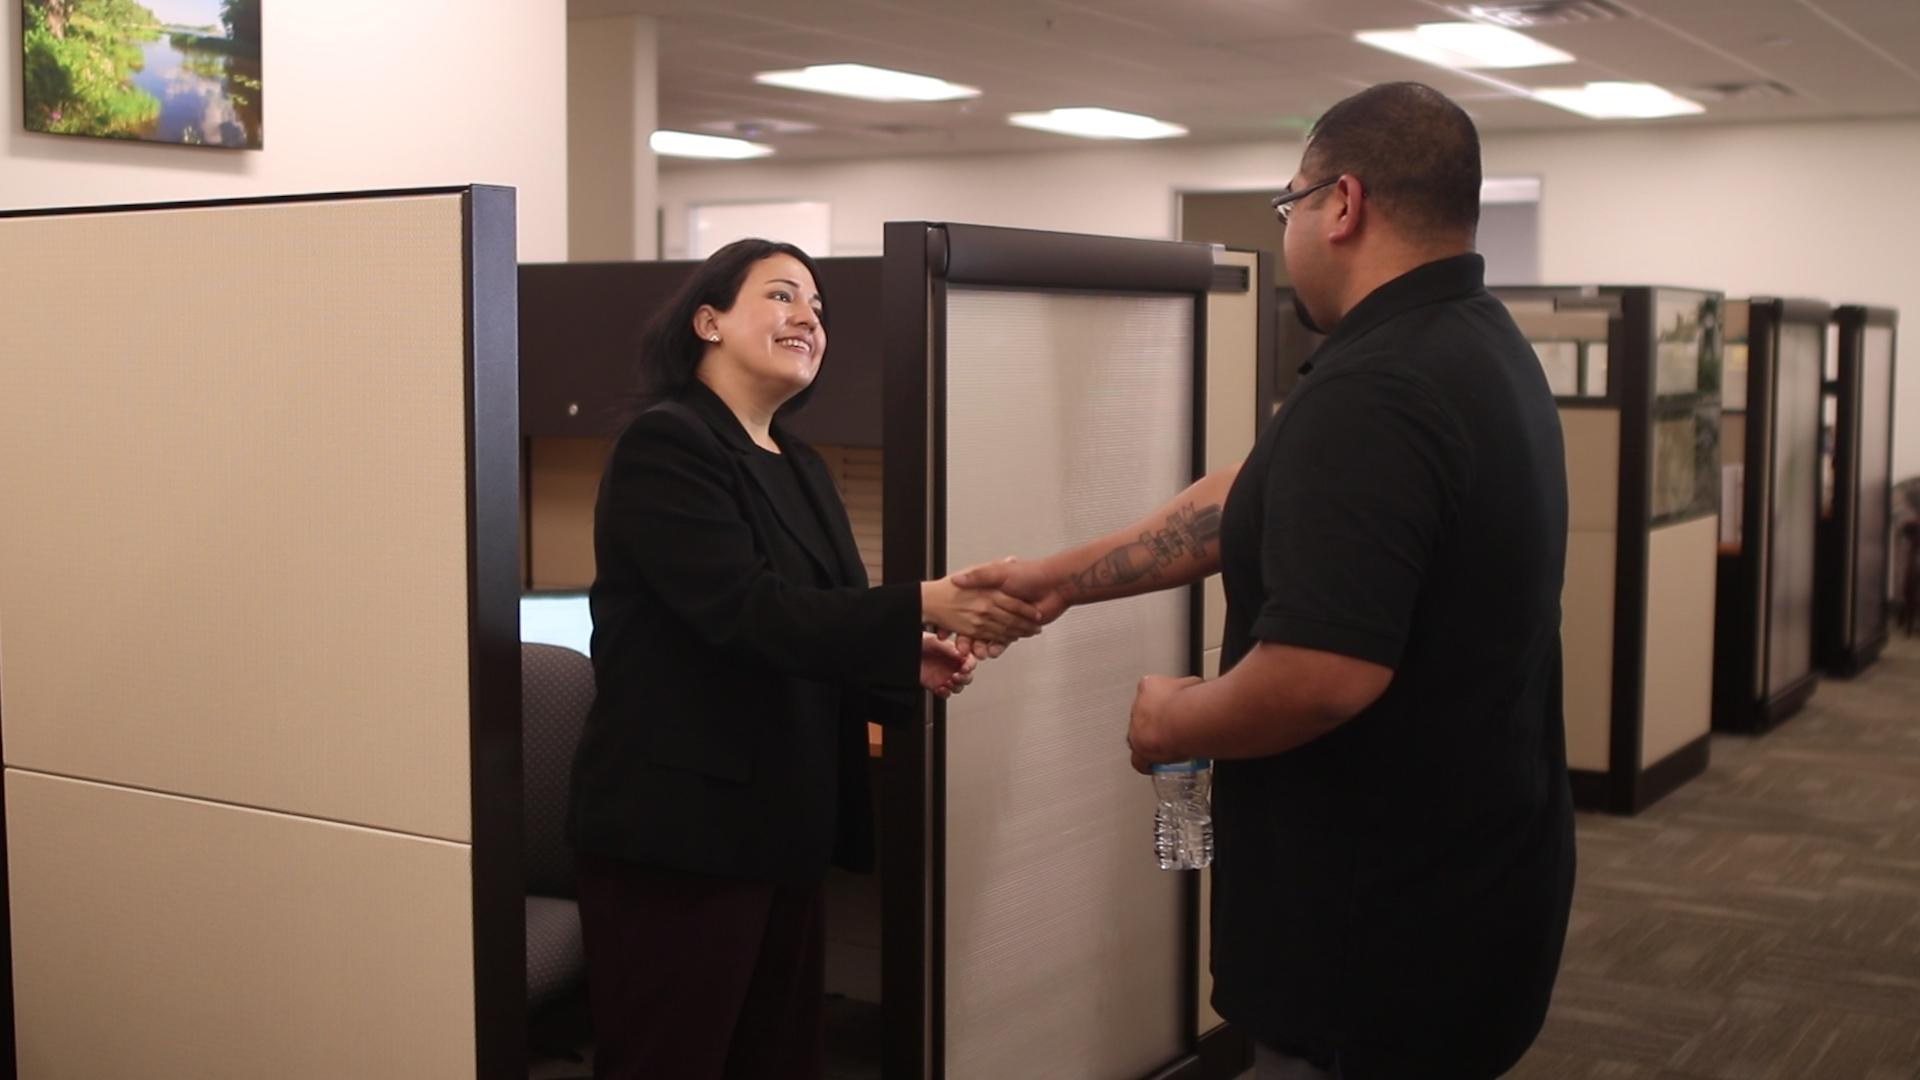 St. Joseph Hospital - A Gracious Reception, Training Video (2017)